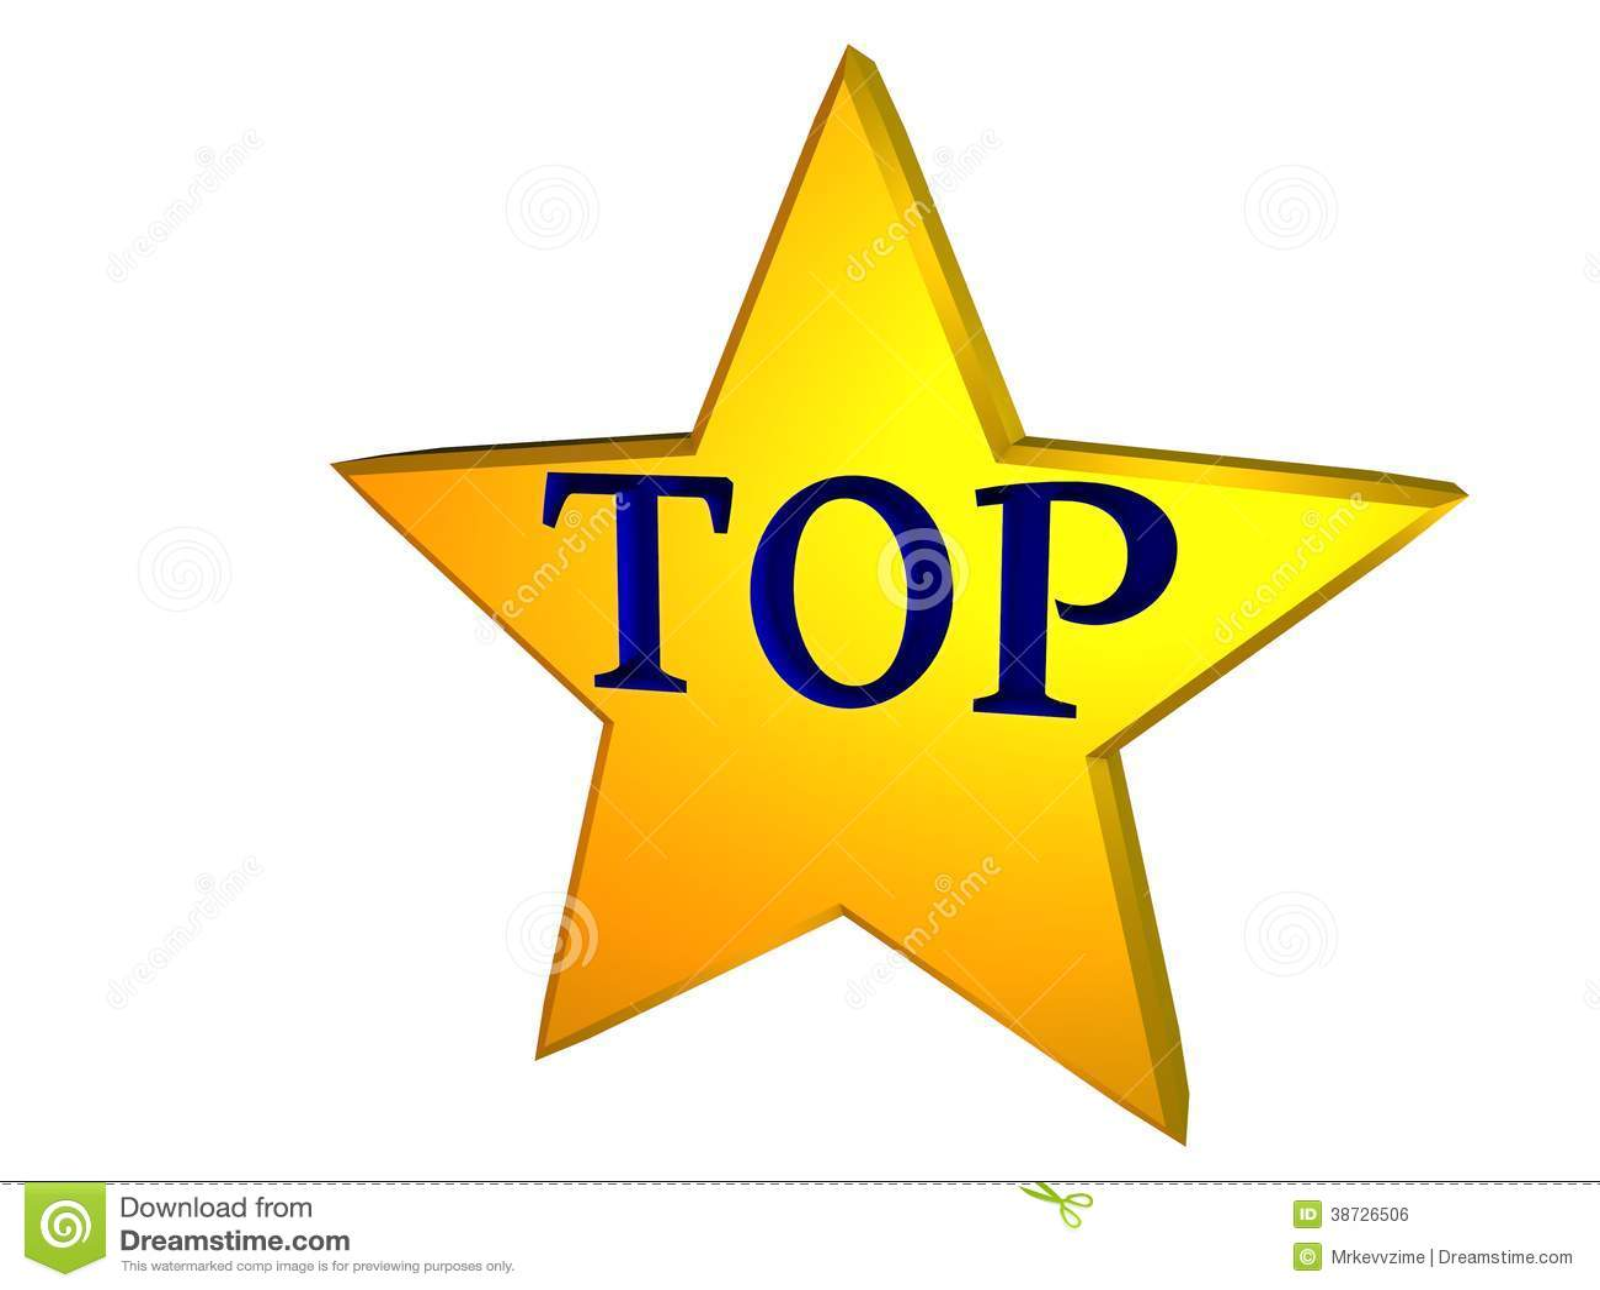 Top Star Stock Illustration Illustration Of Shiny Gold